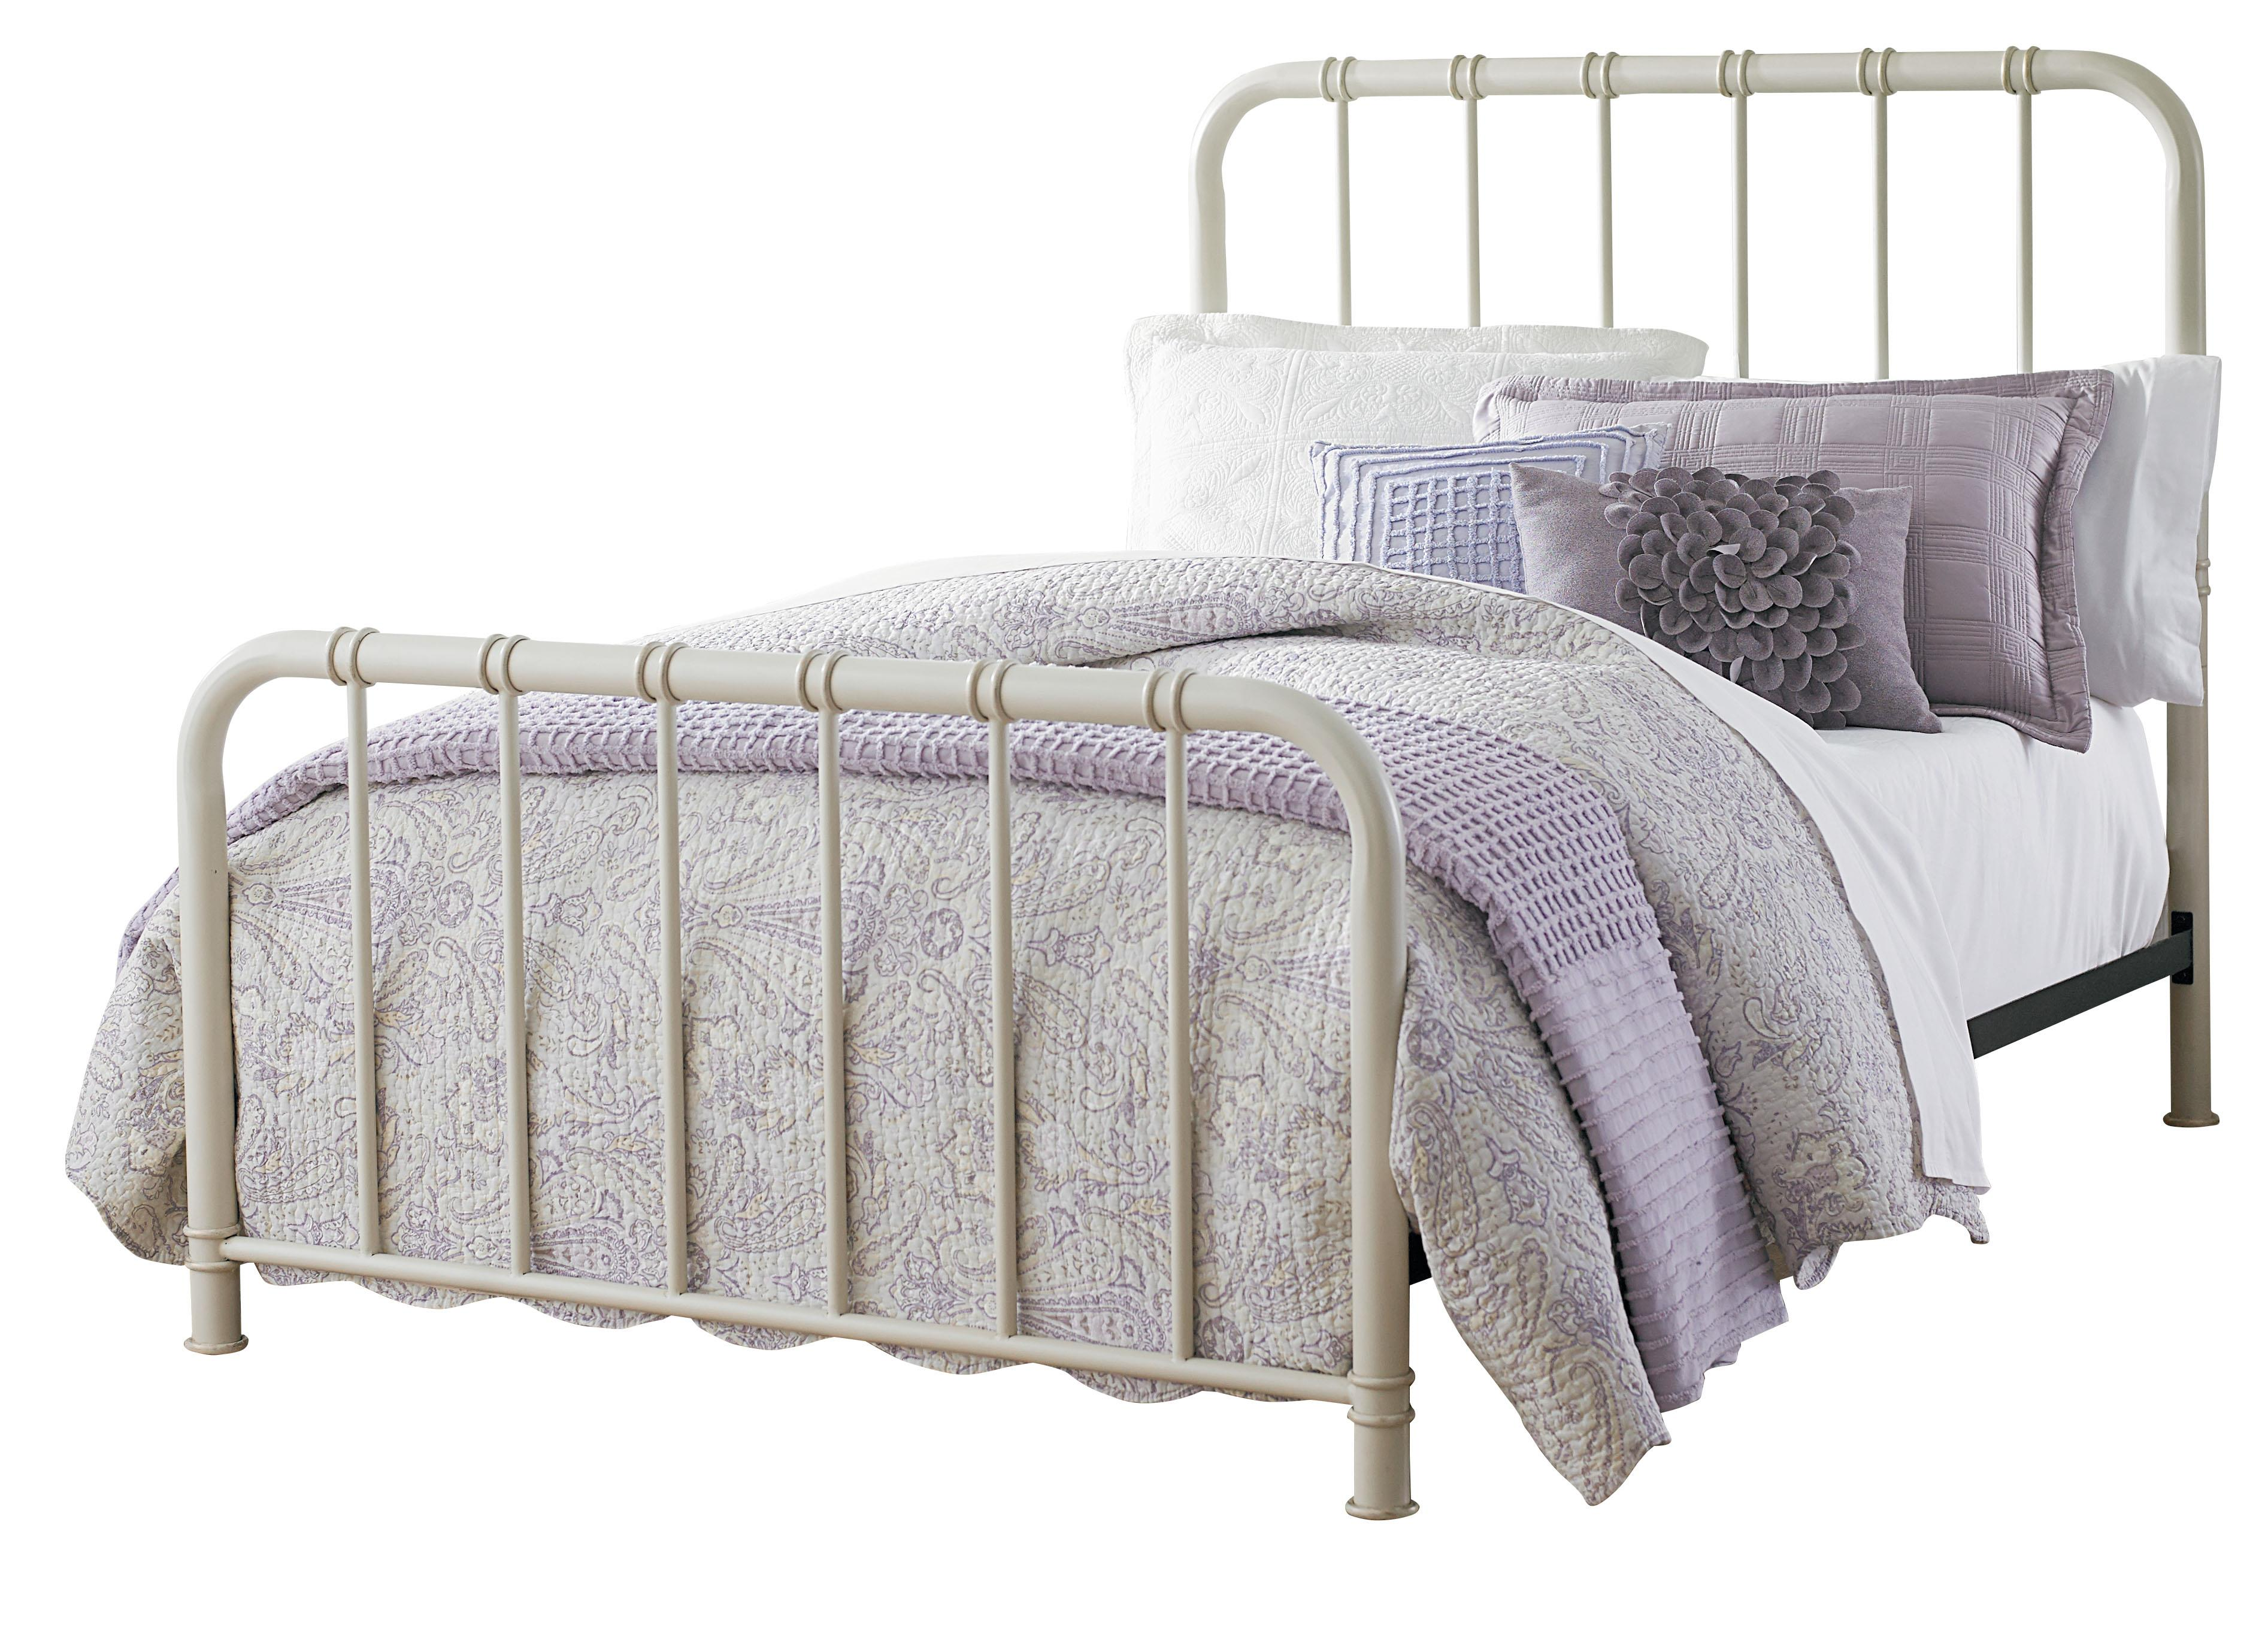 Standard Furniture Tristen Queen Metal Bed With Tubular